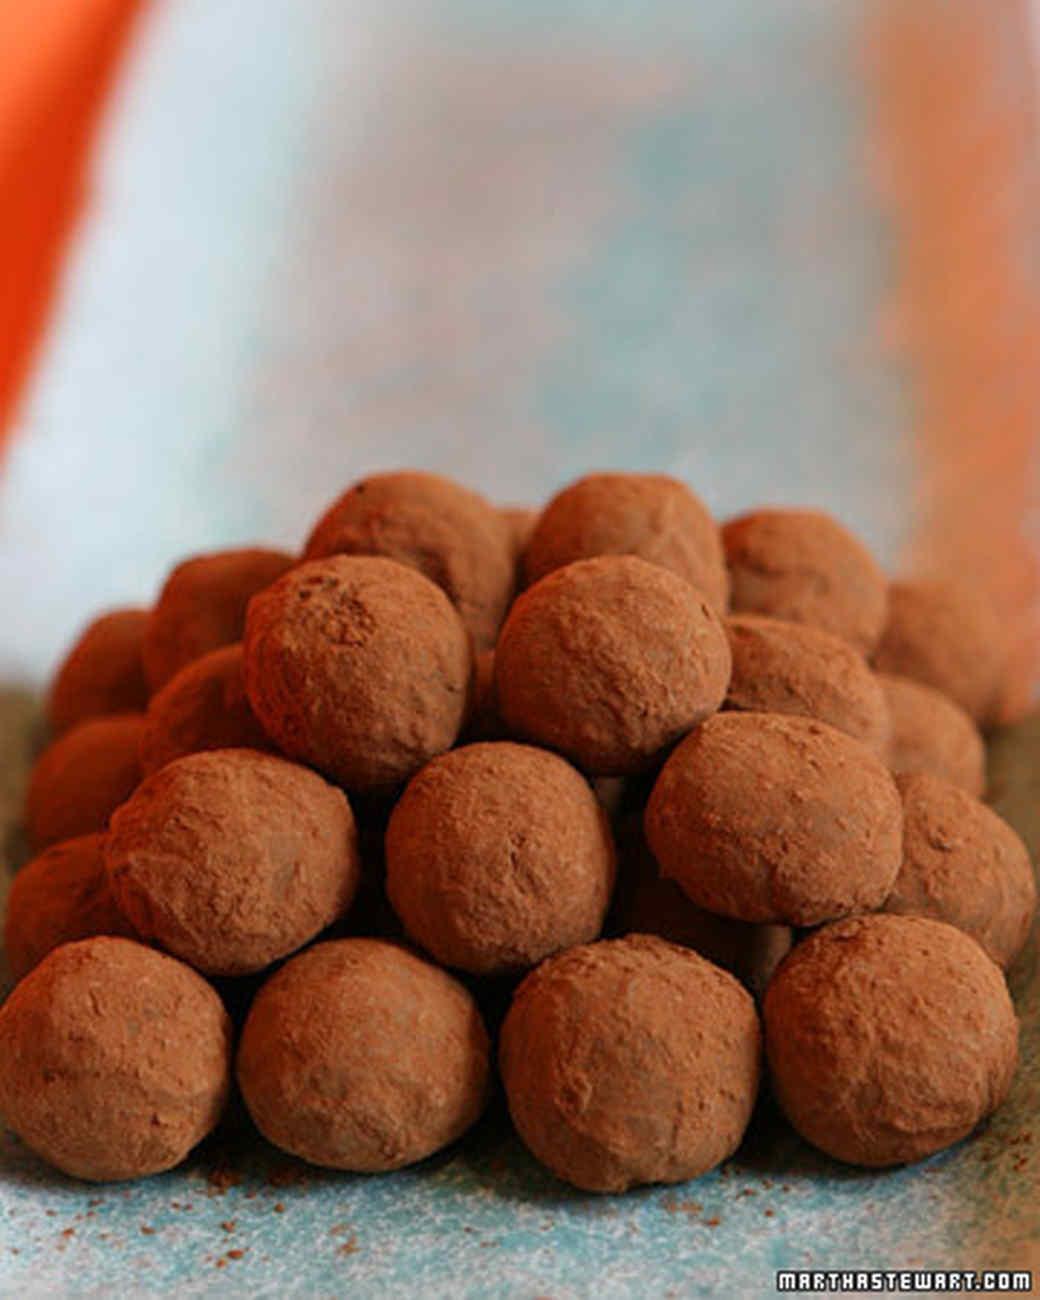 Chocolate Truffle Recipes | Martha Stewart